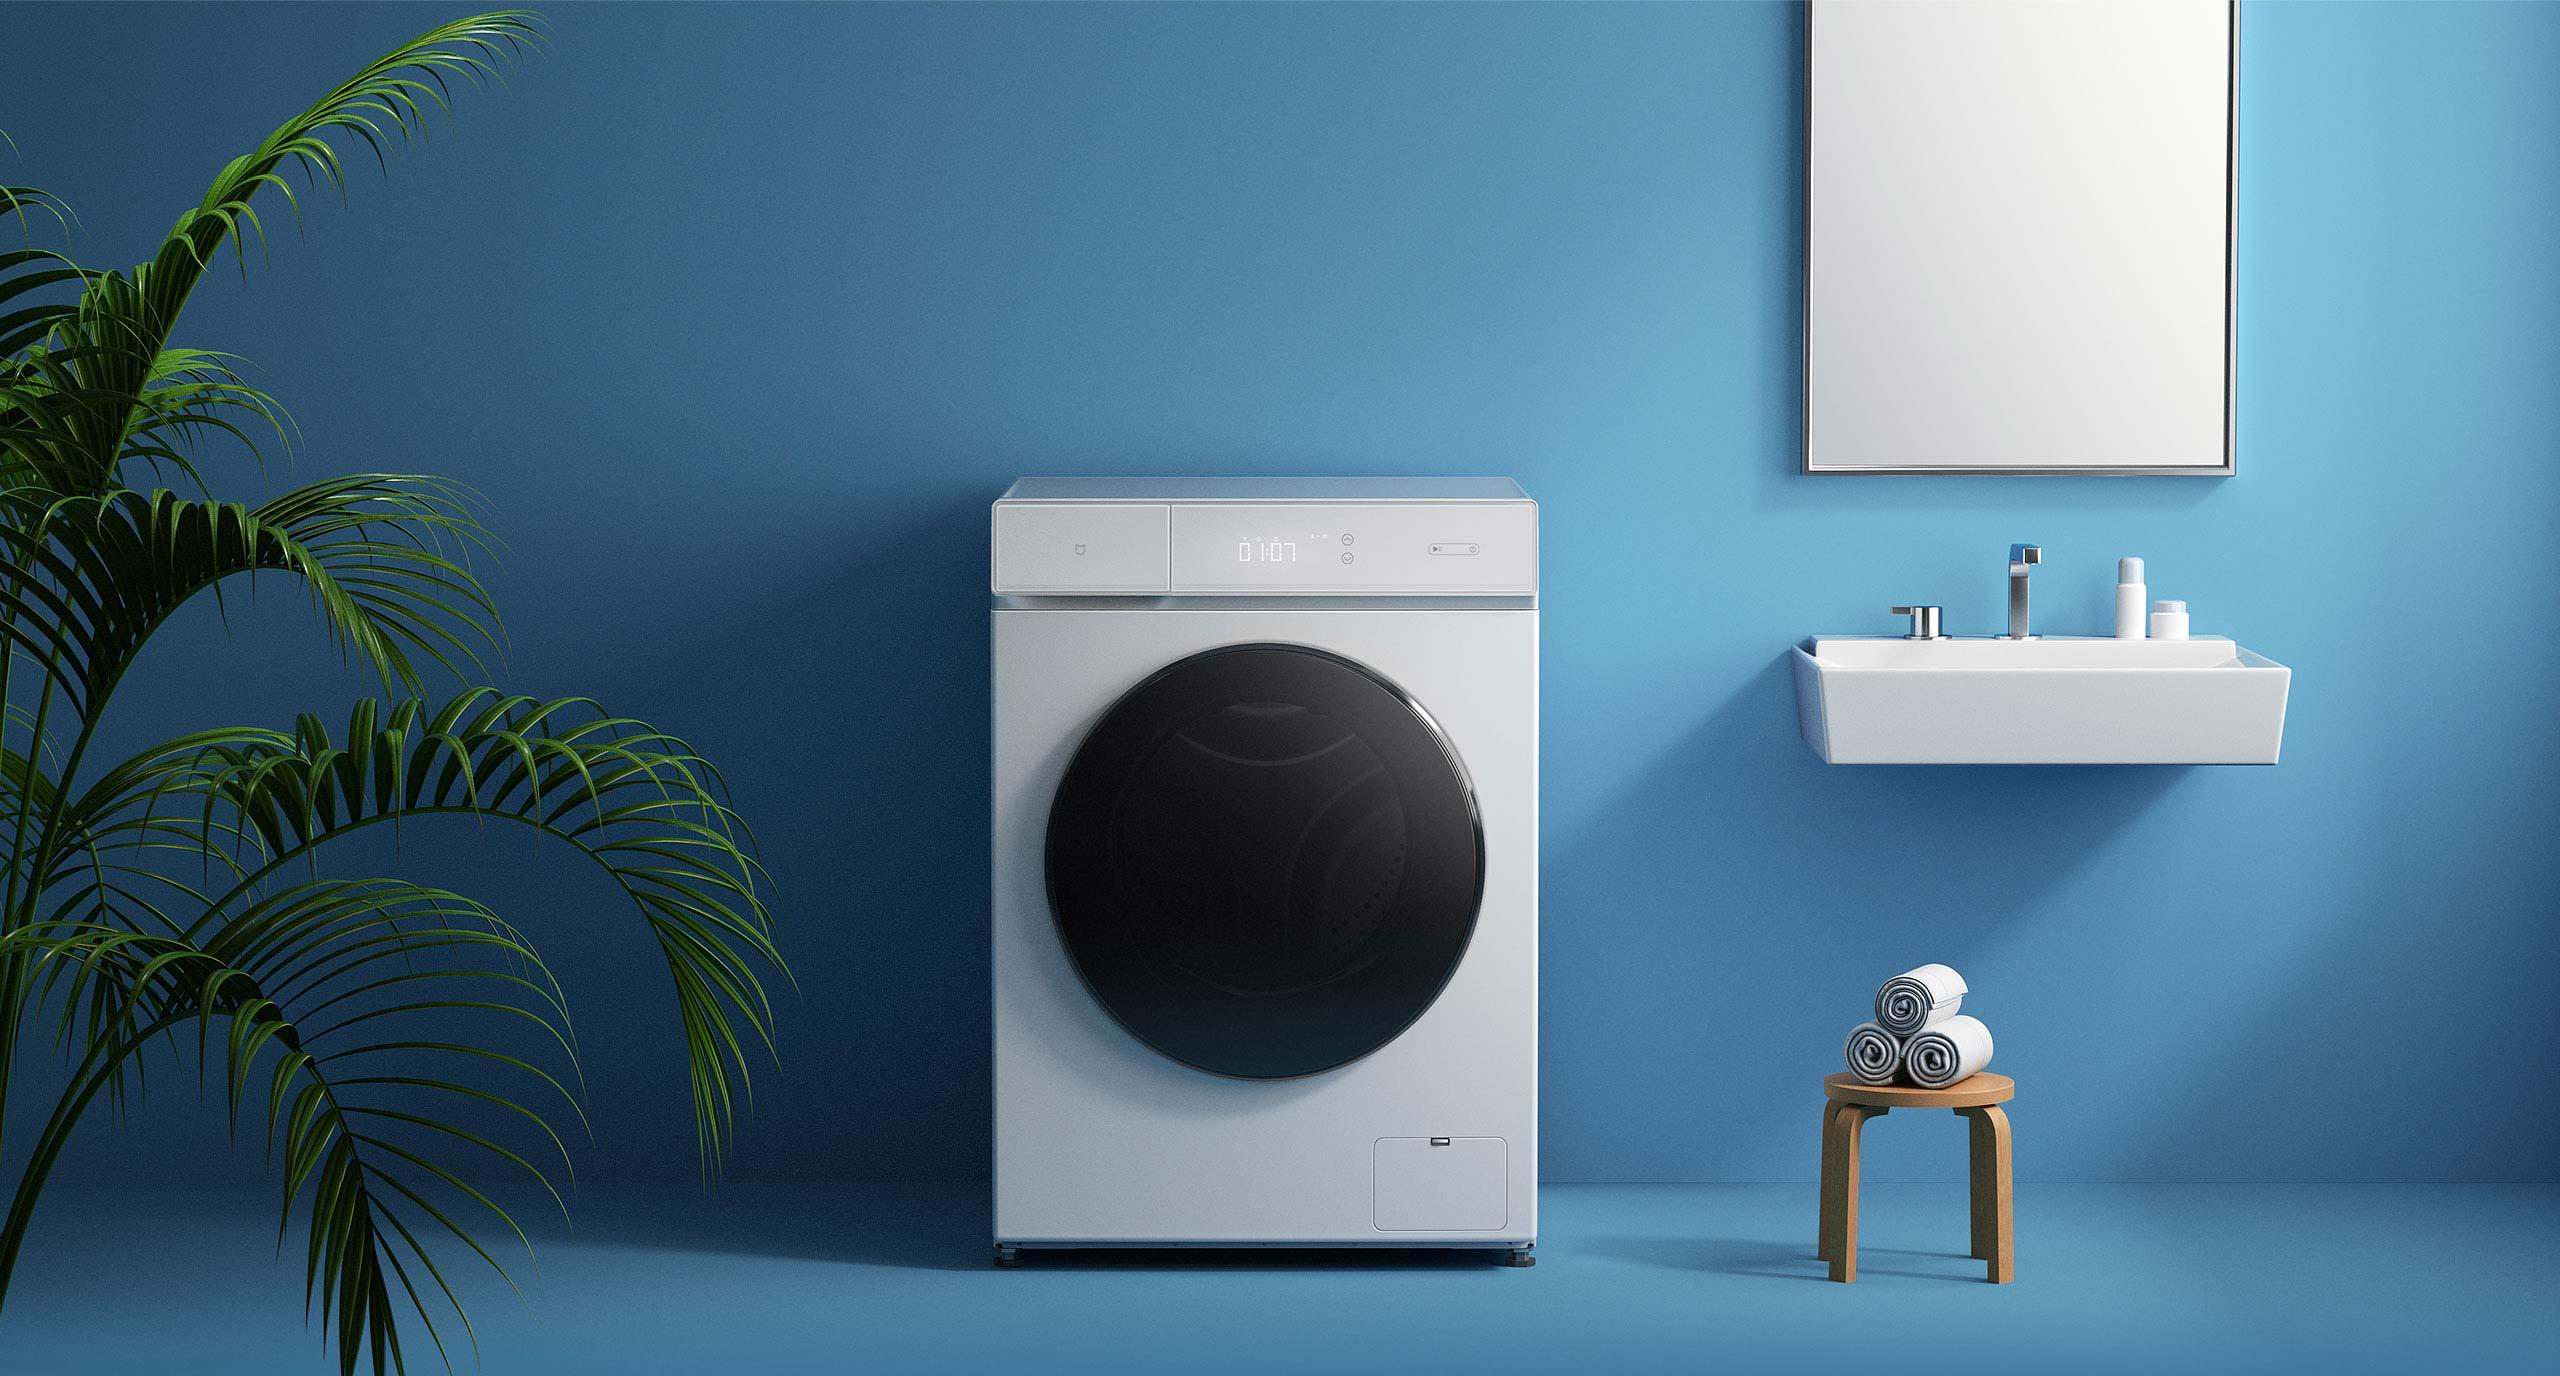 MIJIA Internet Washing Machine and Dryer Pro